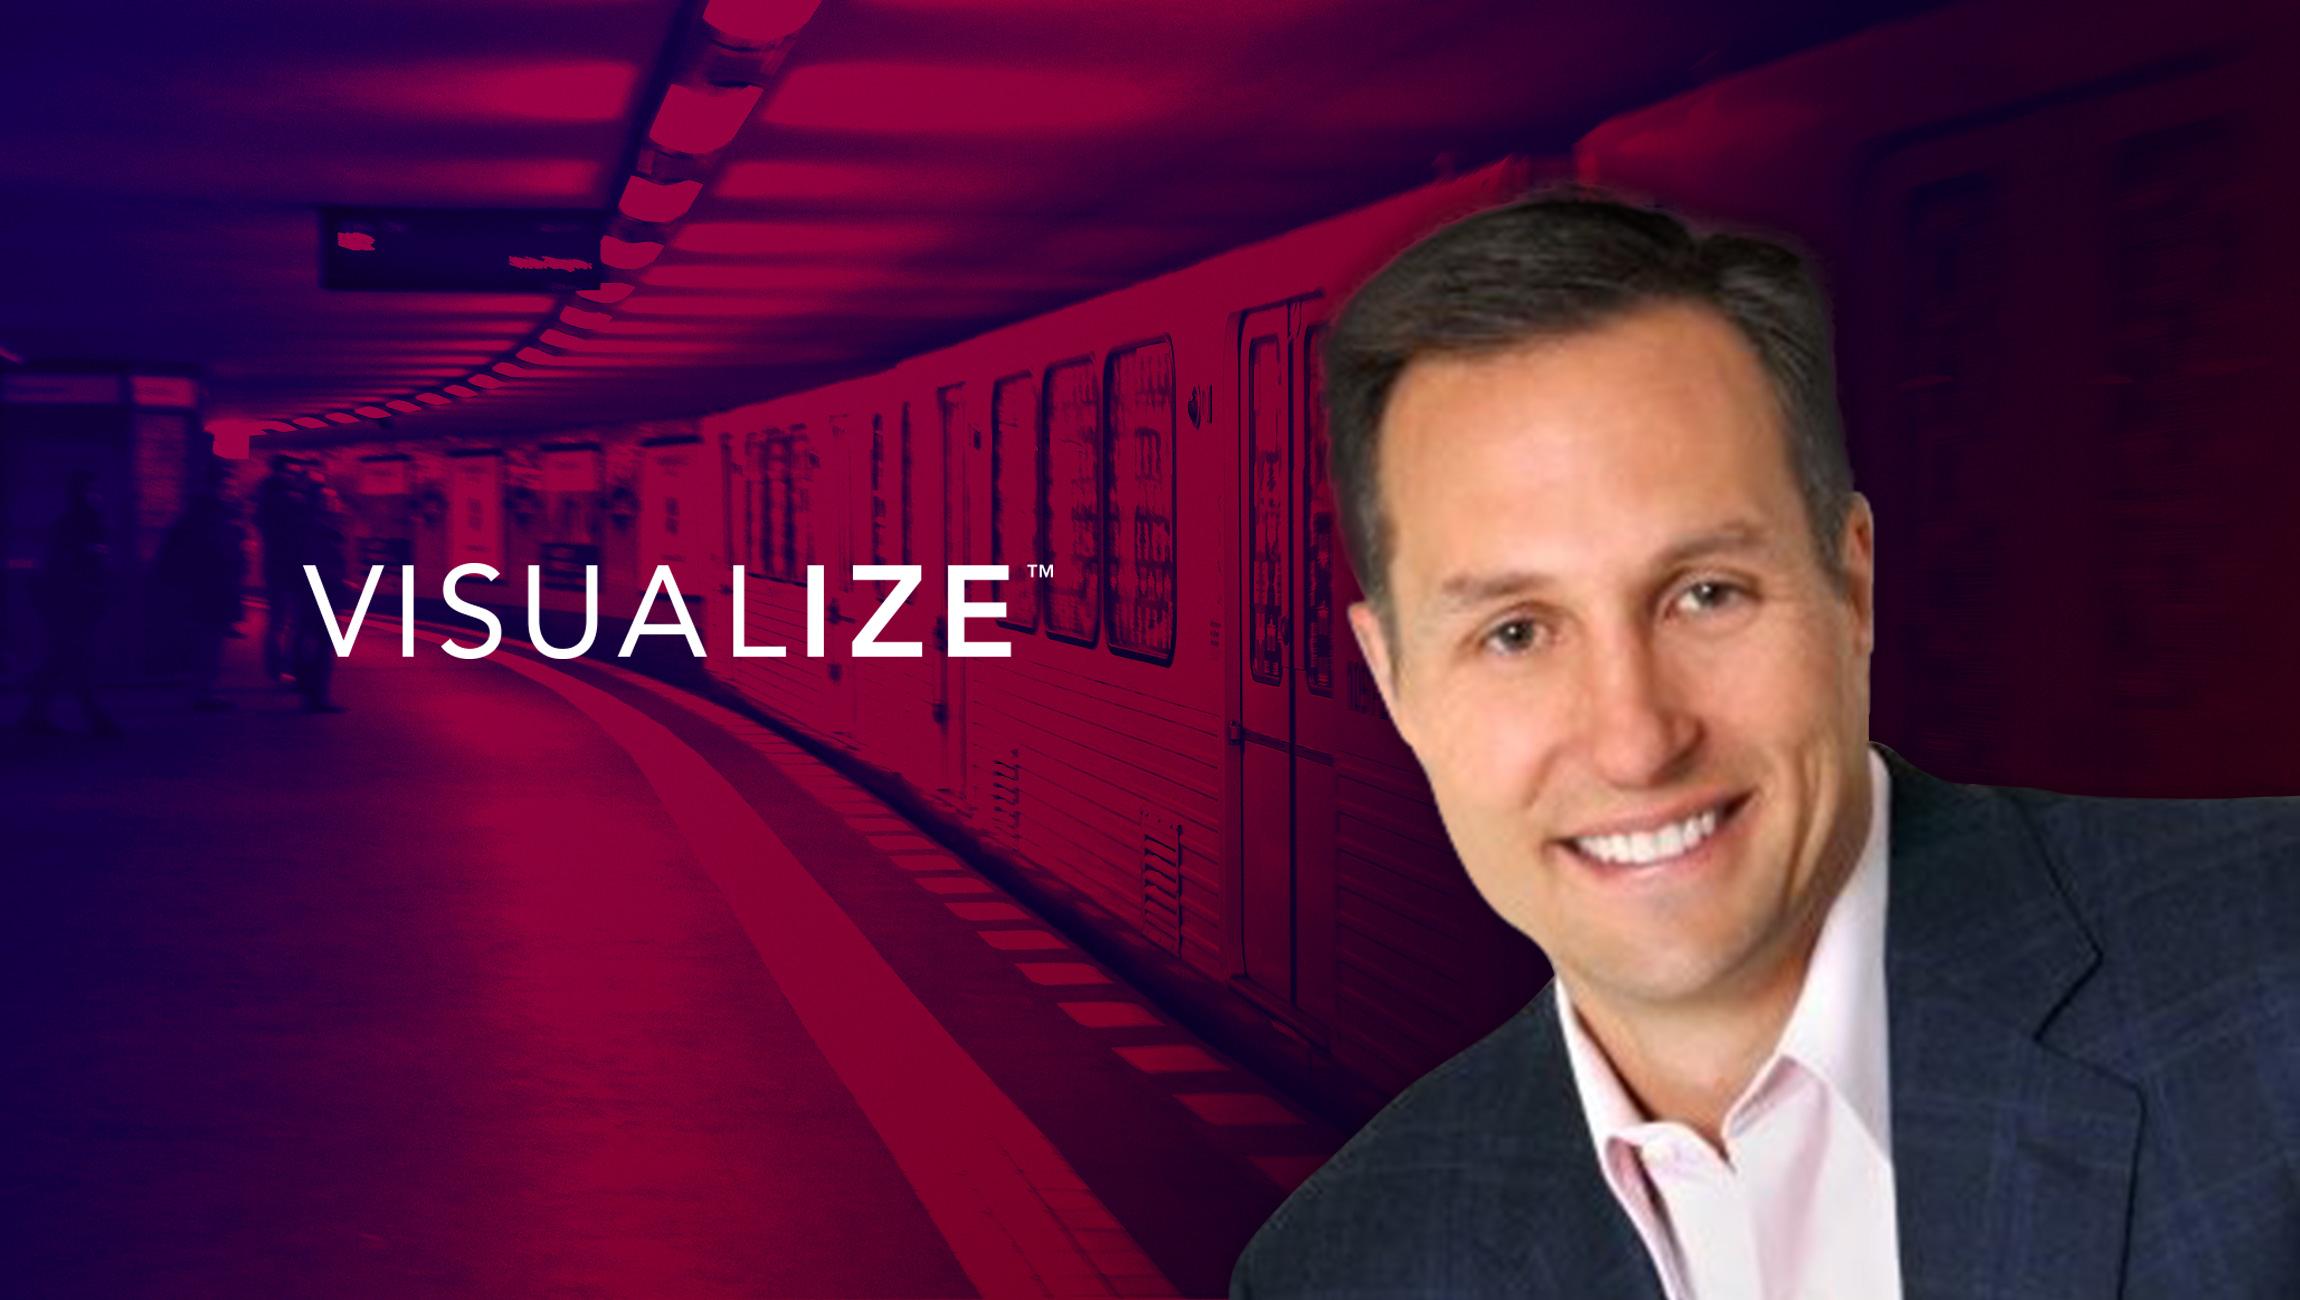 SalesTech Interview With Scott Anschuetz, CEO at Visualize